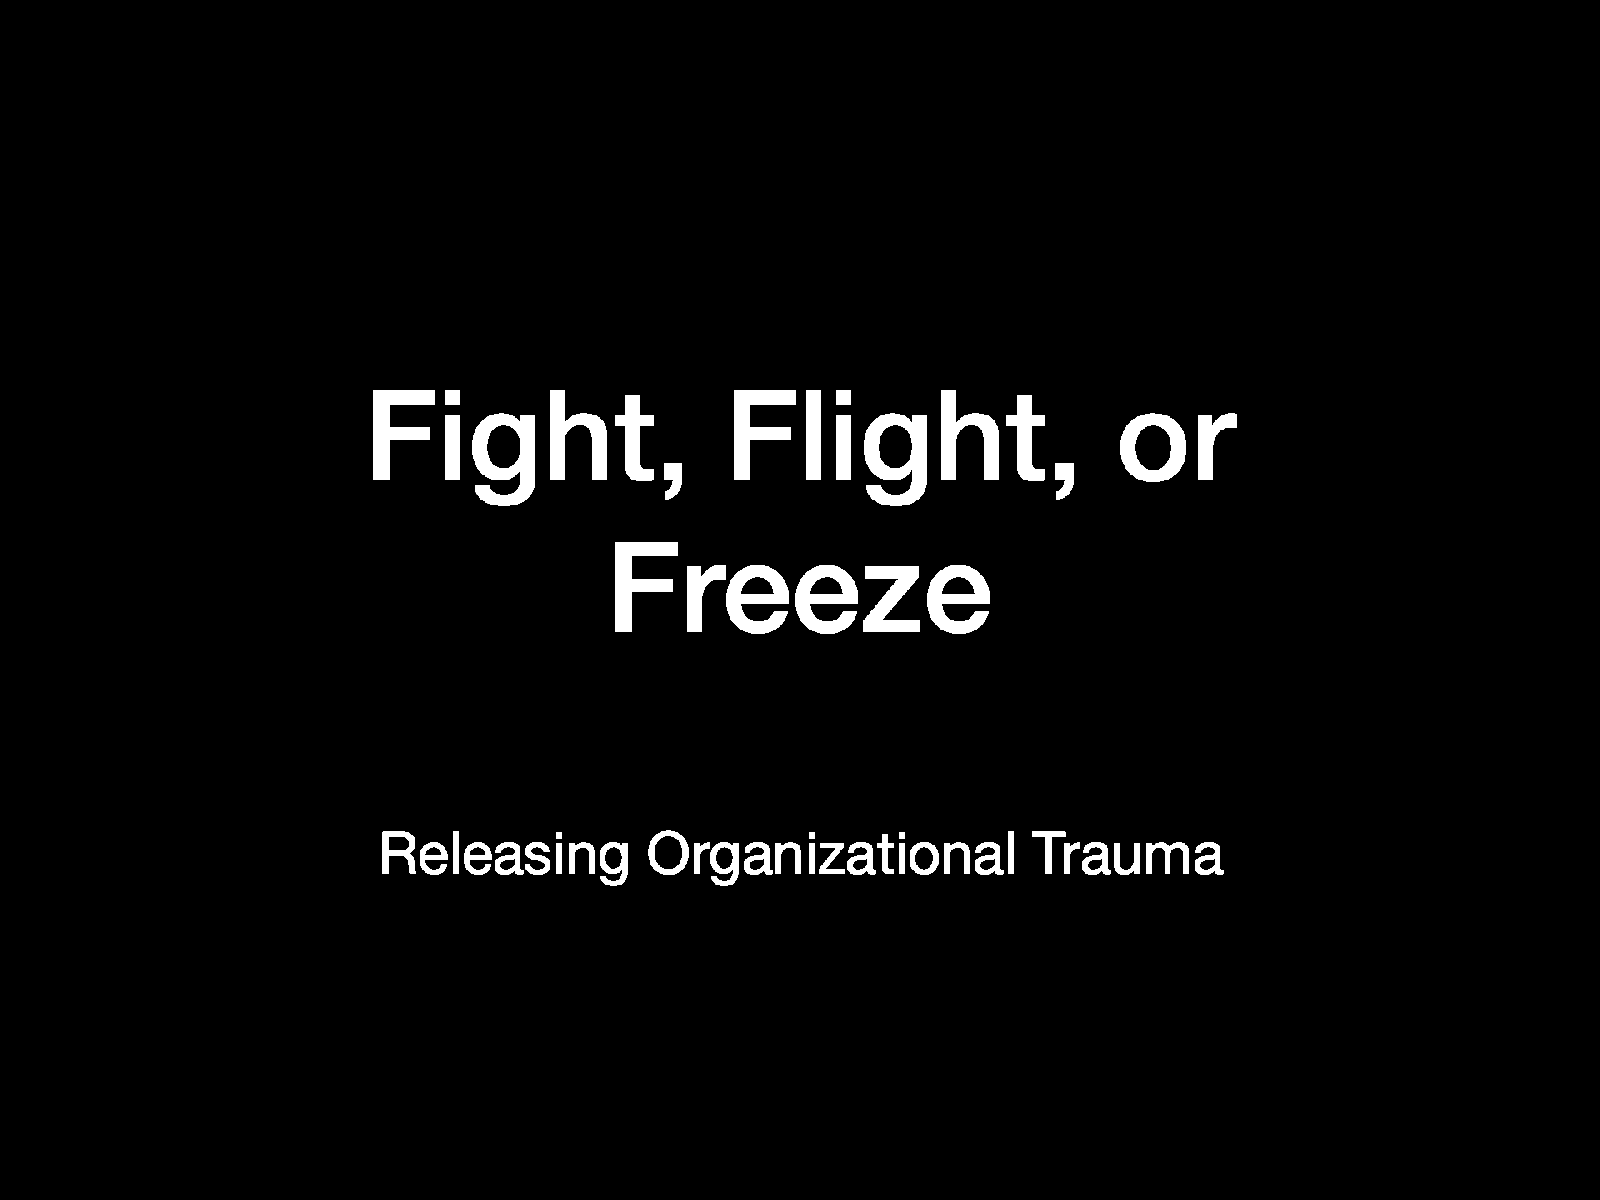 Fight, Flight, or Freeze — Releasing Organizational Trauma